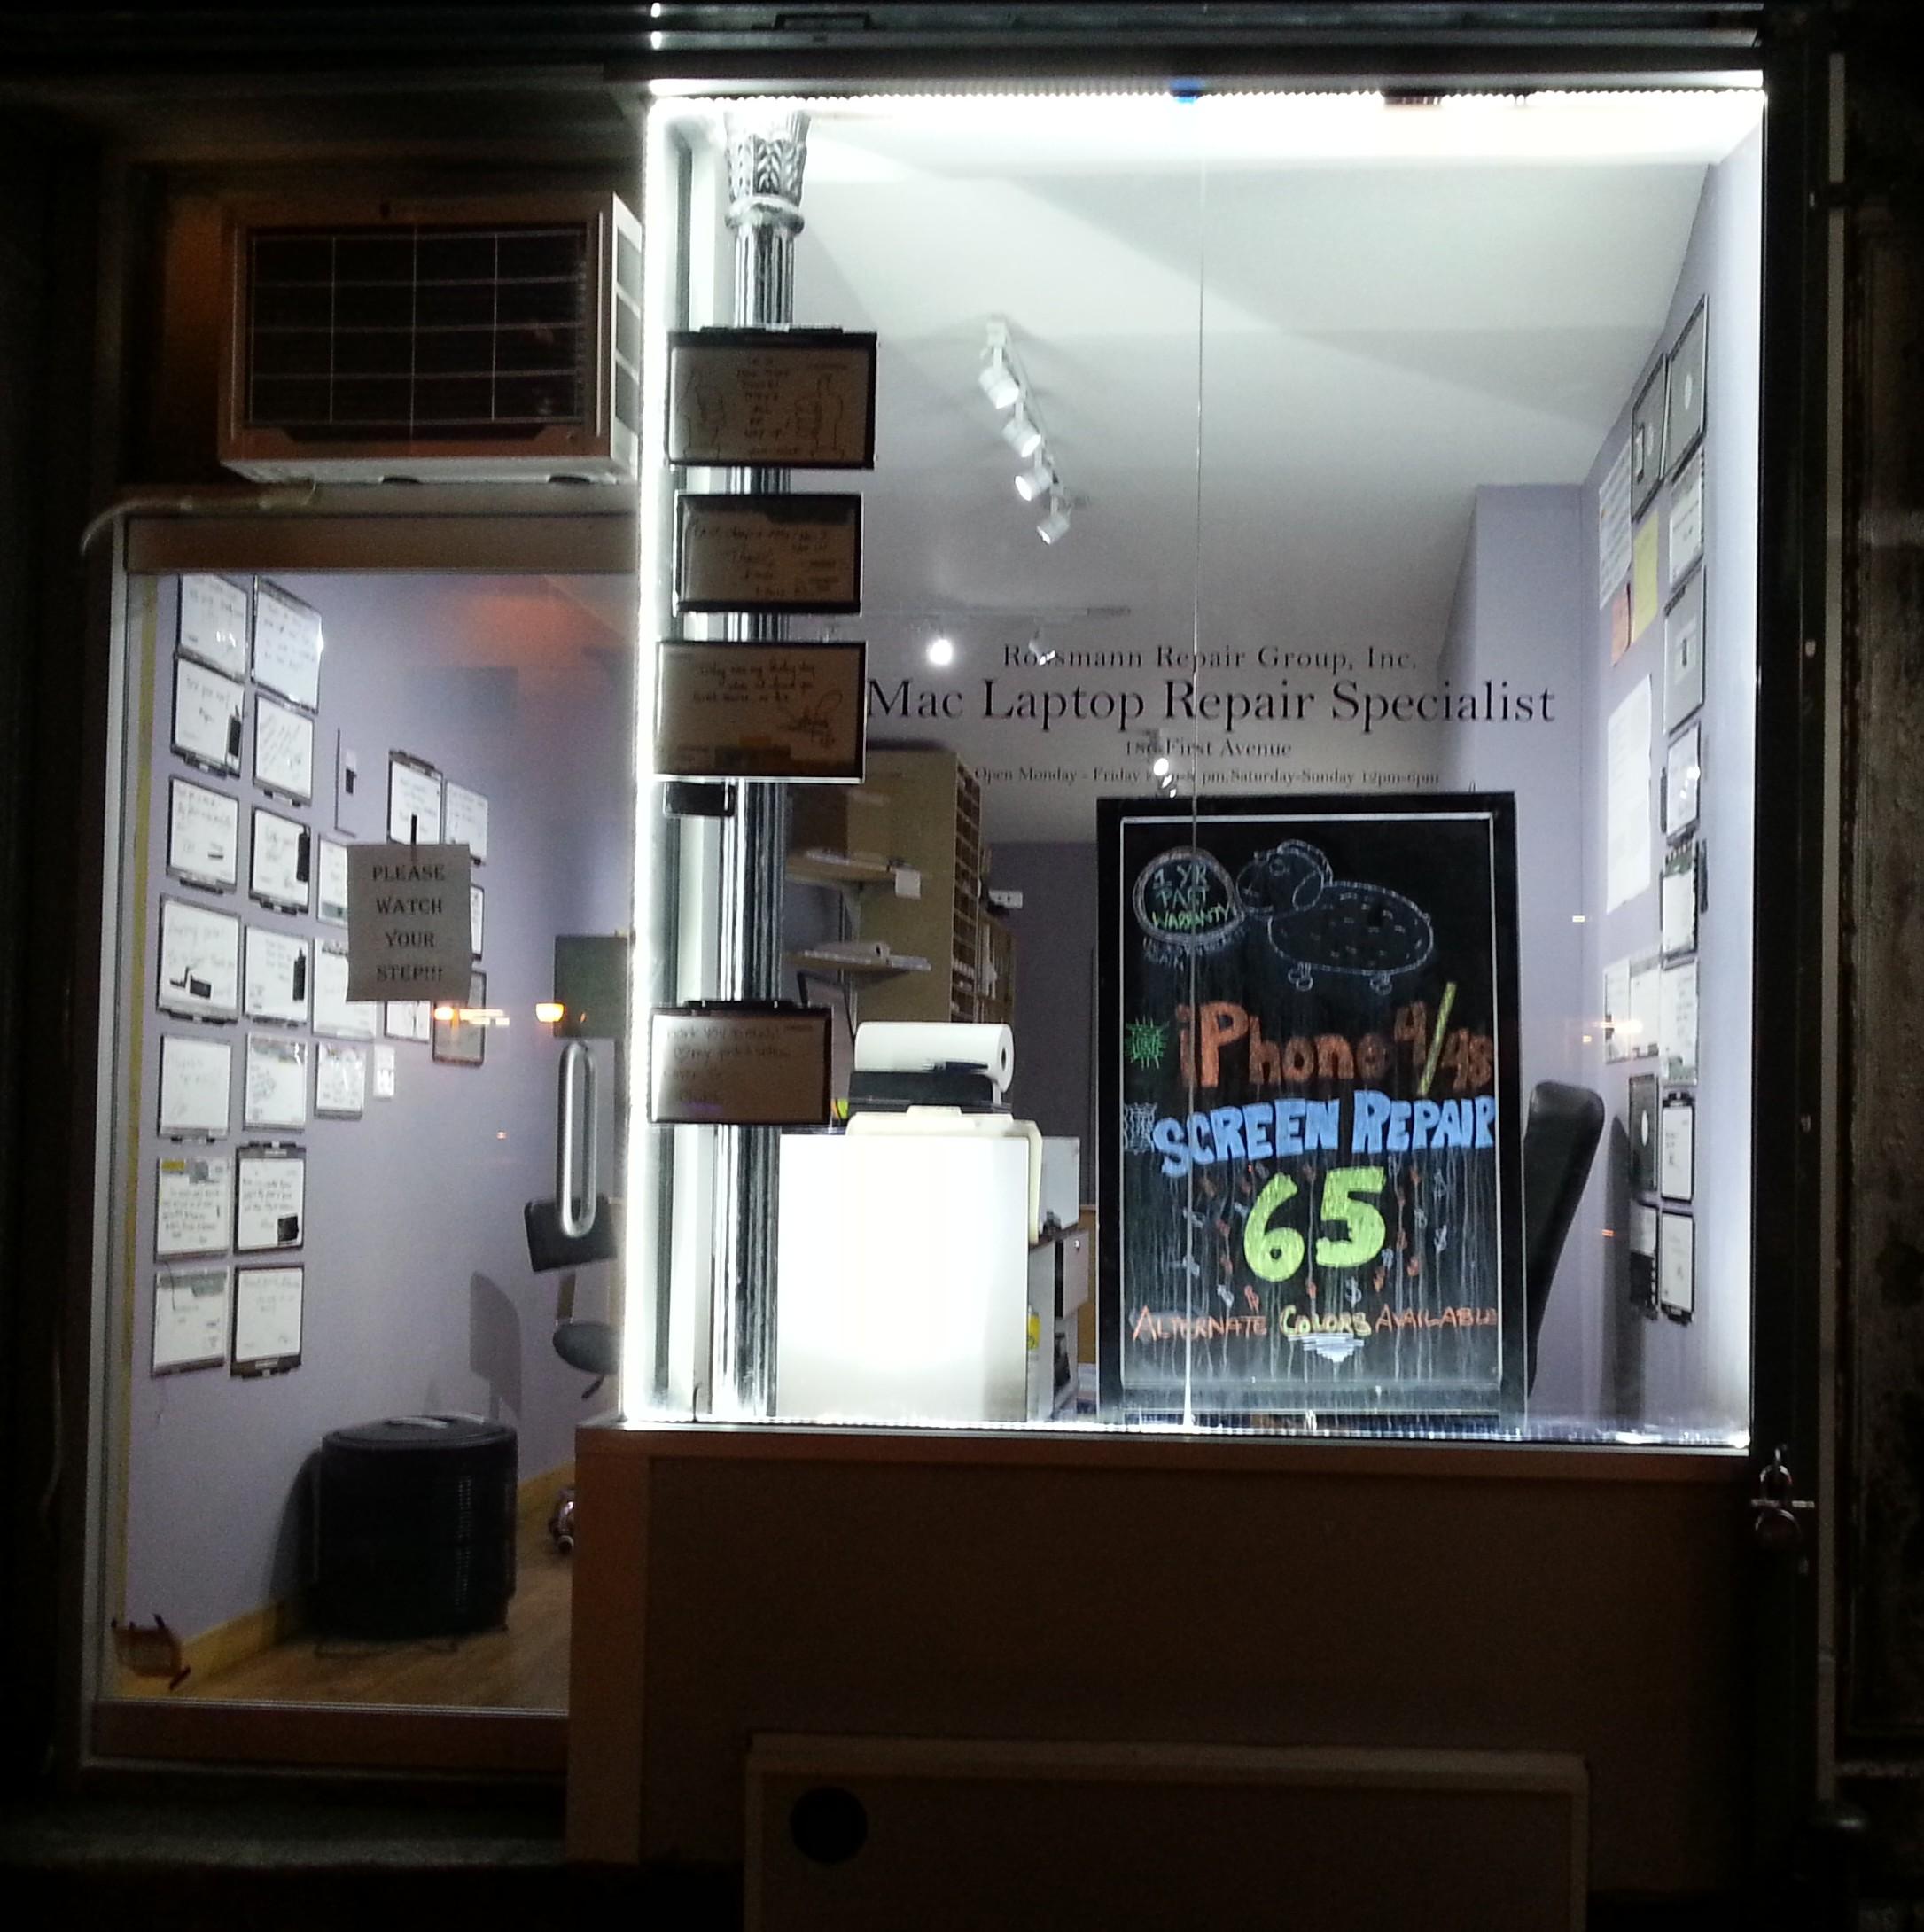 rossmann group storefront